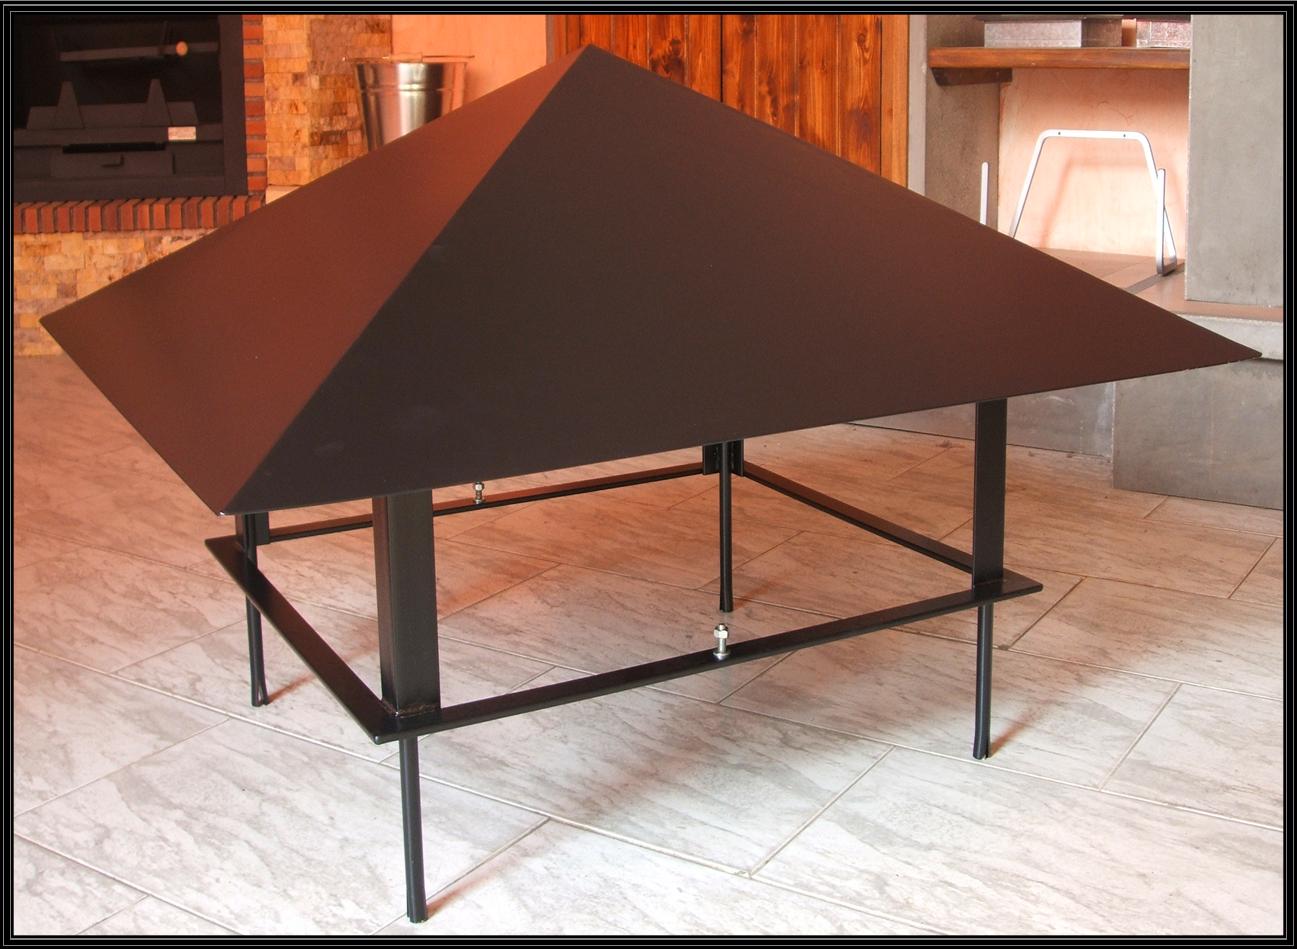 Chimeneas sierra tejado para ca on de obra for Tejados de madera para barbacoas